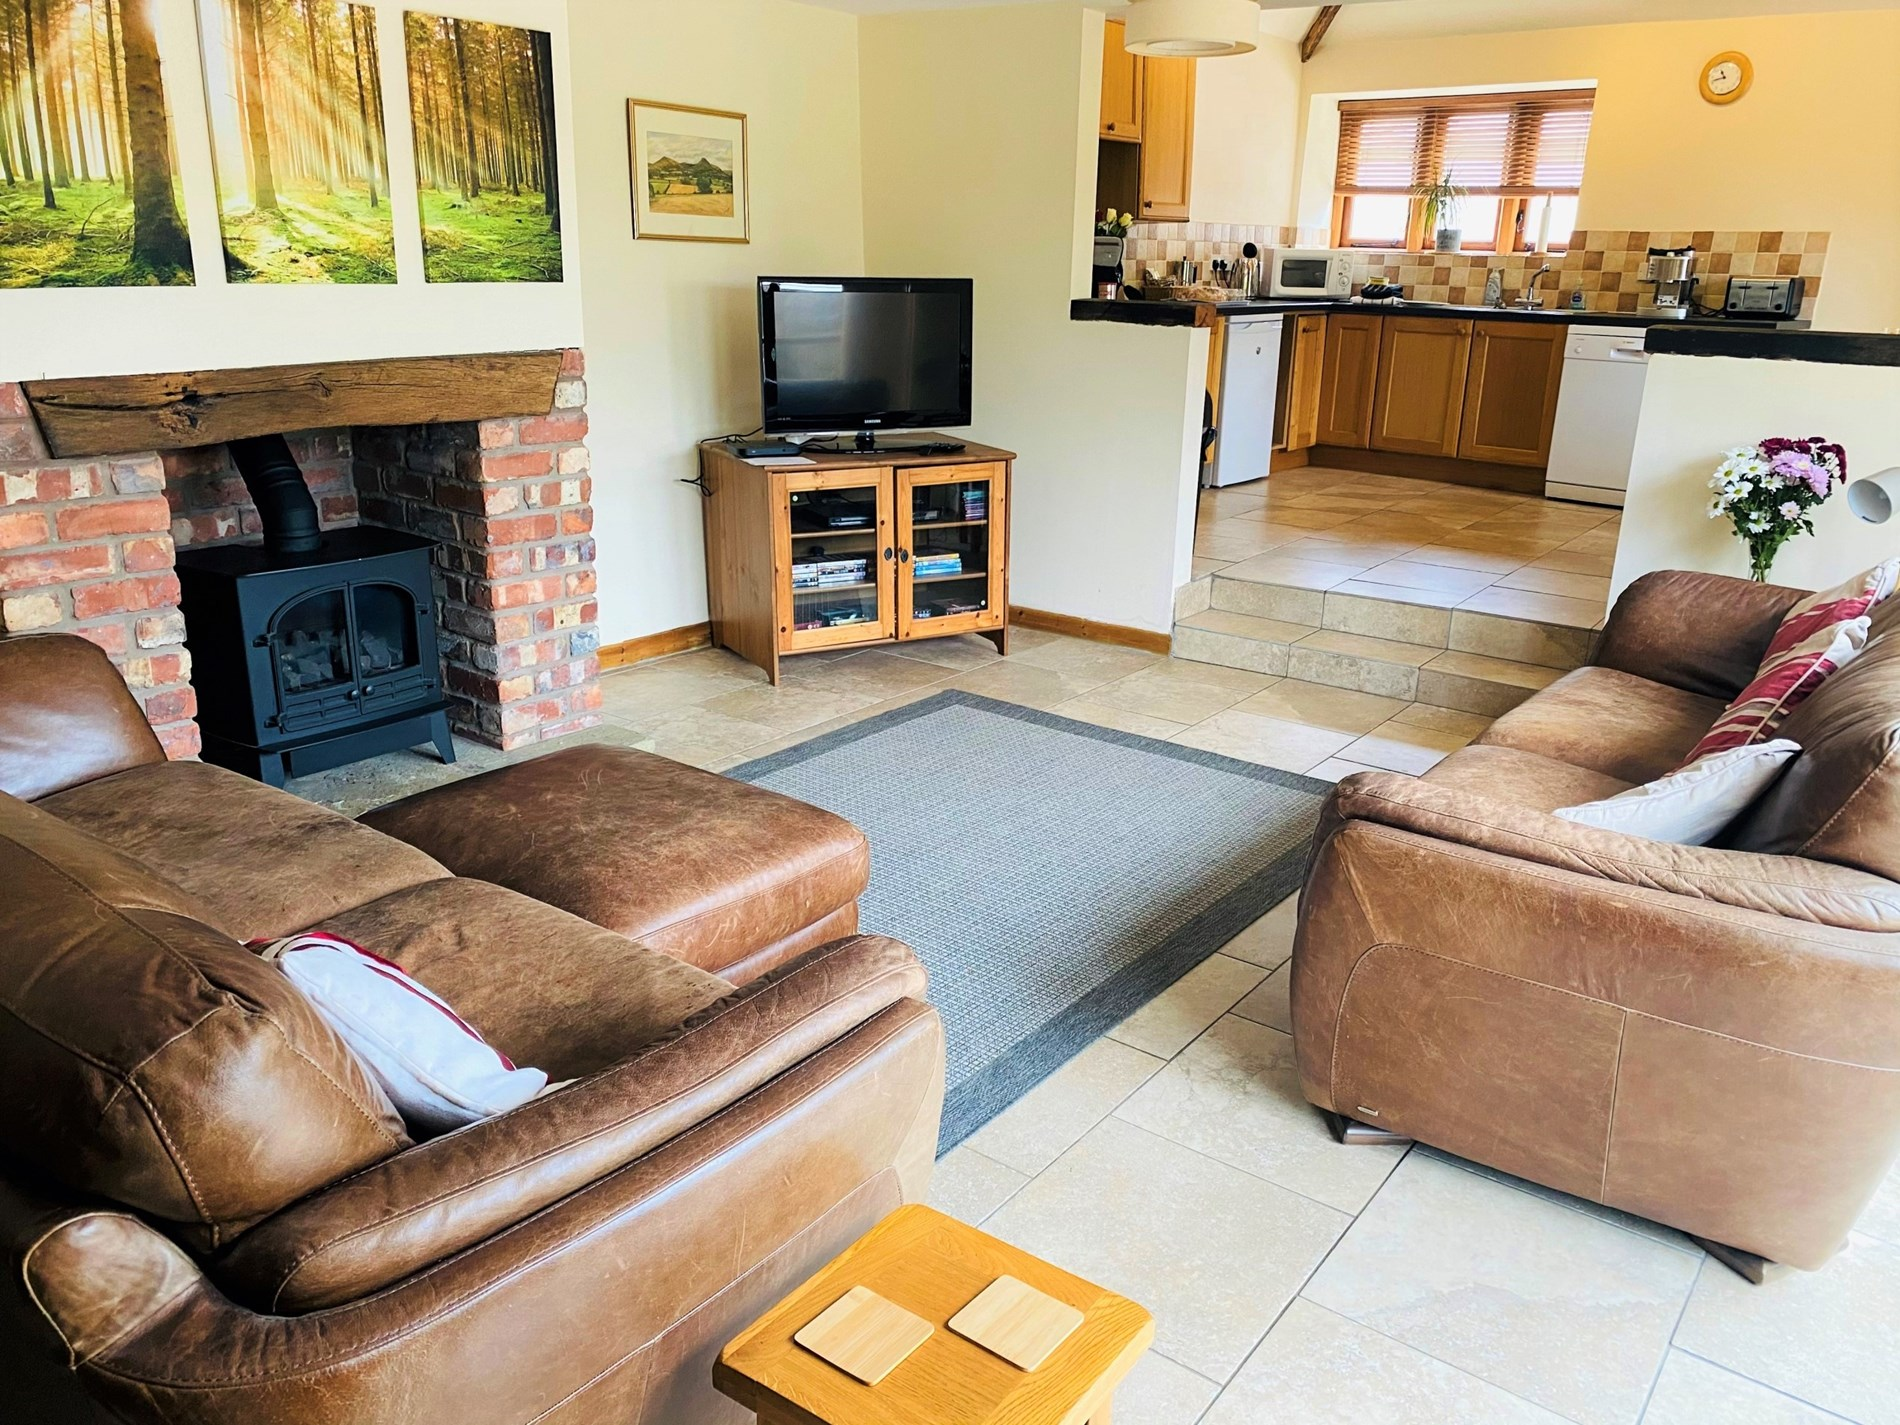 2 Bedroom Cottage in Shrewsbury, Heart of England